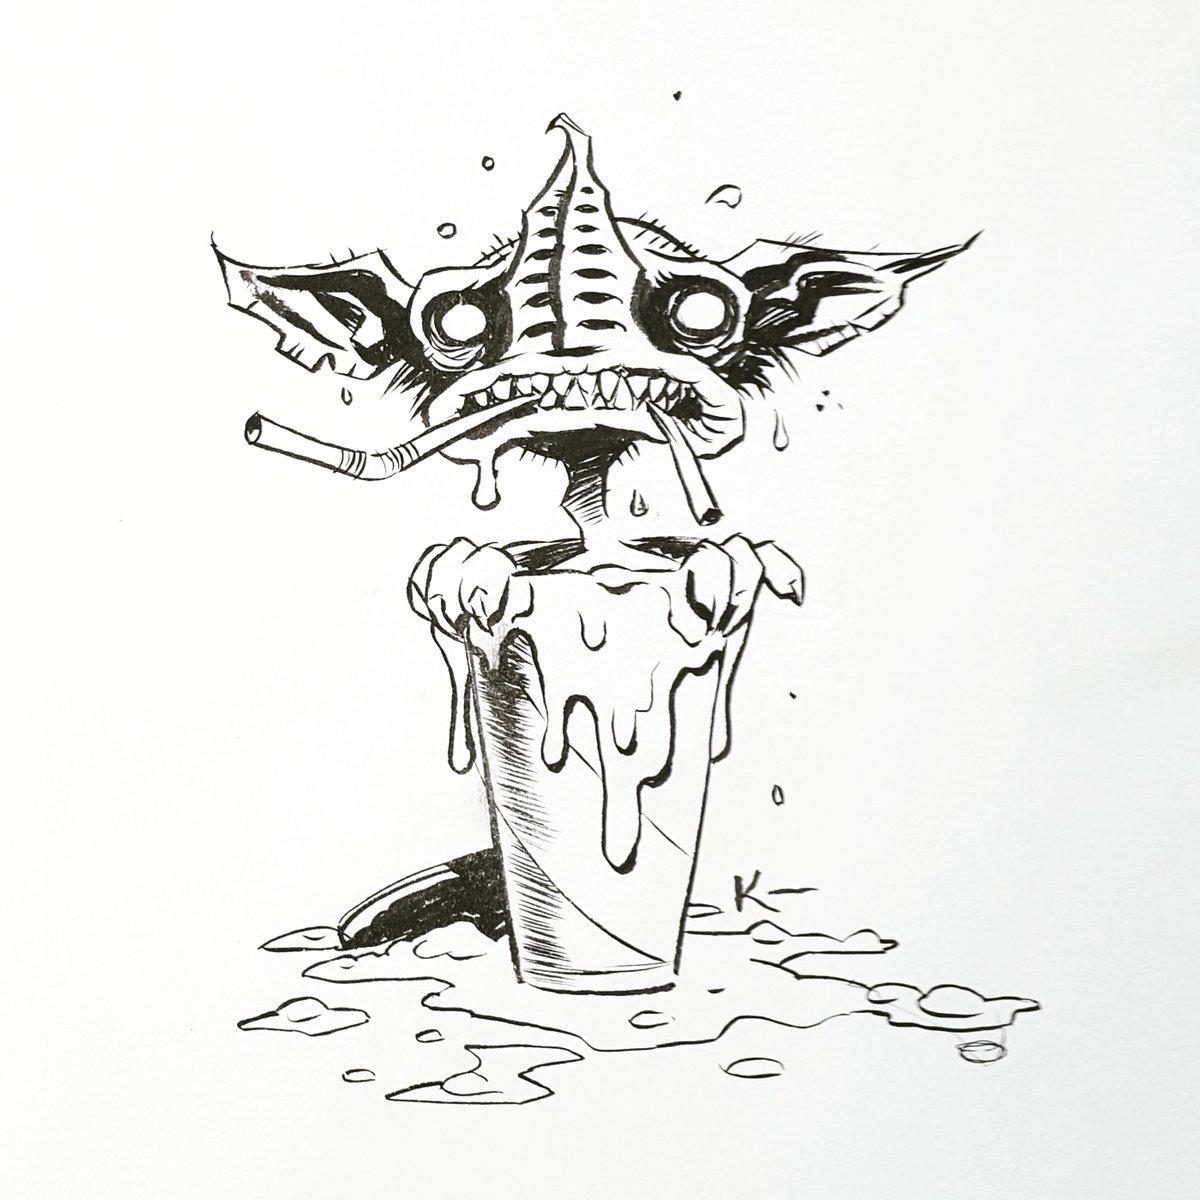 The Milkshake Demon